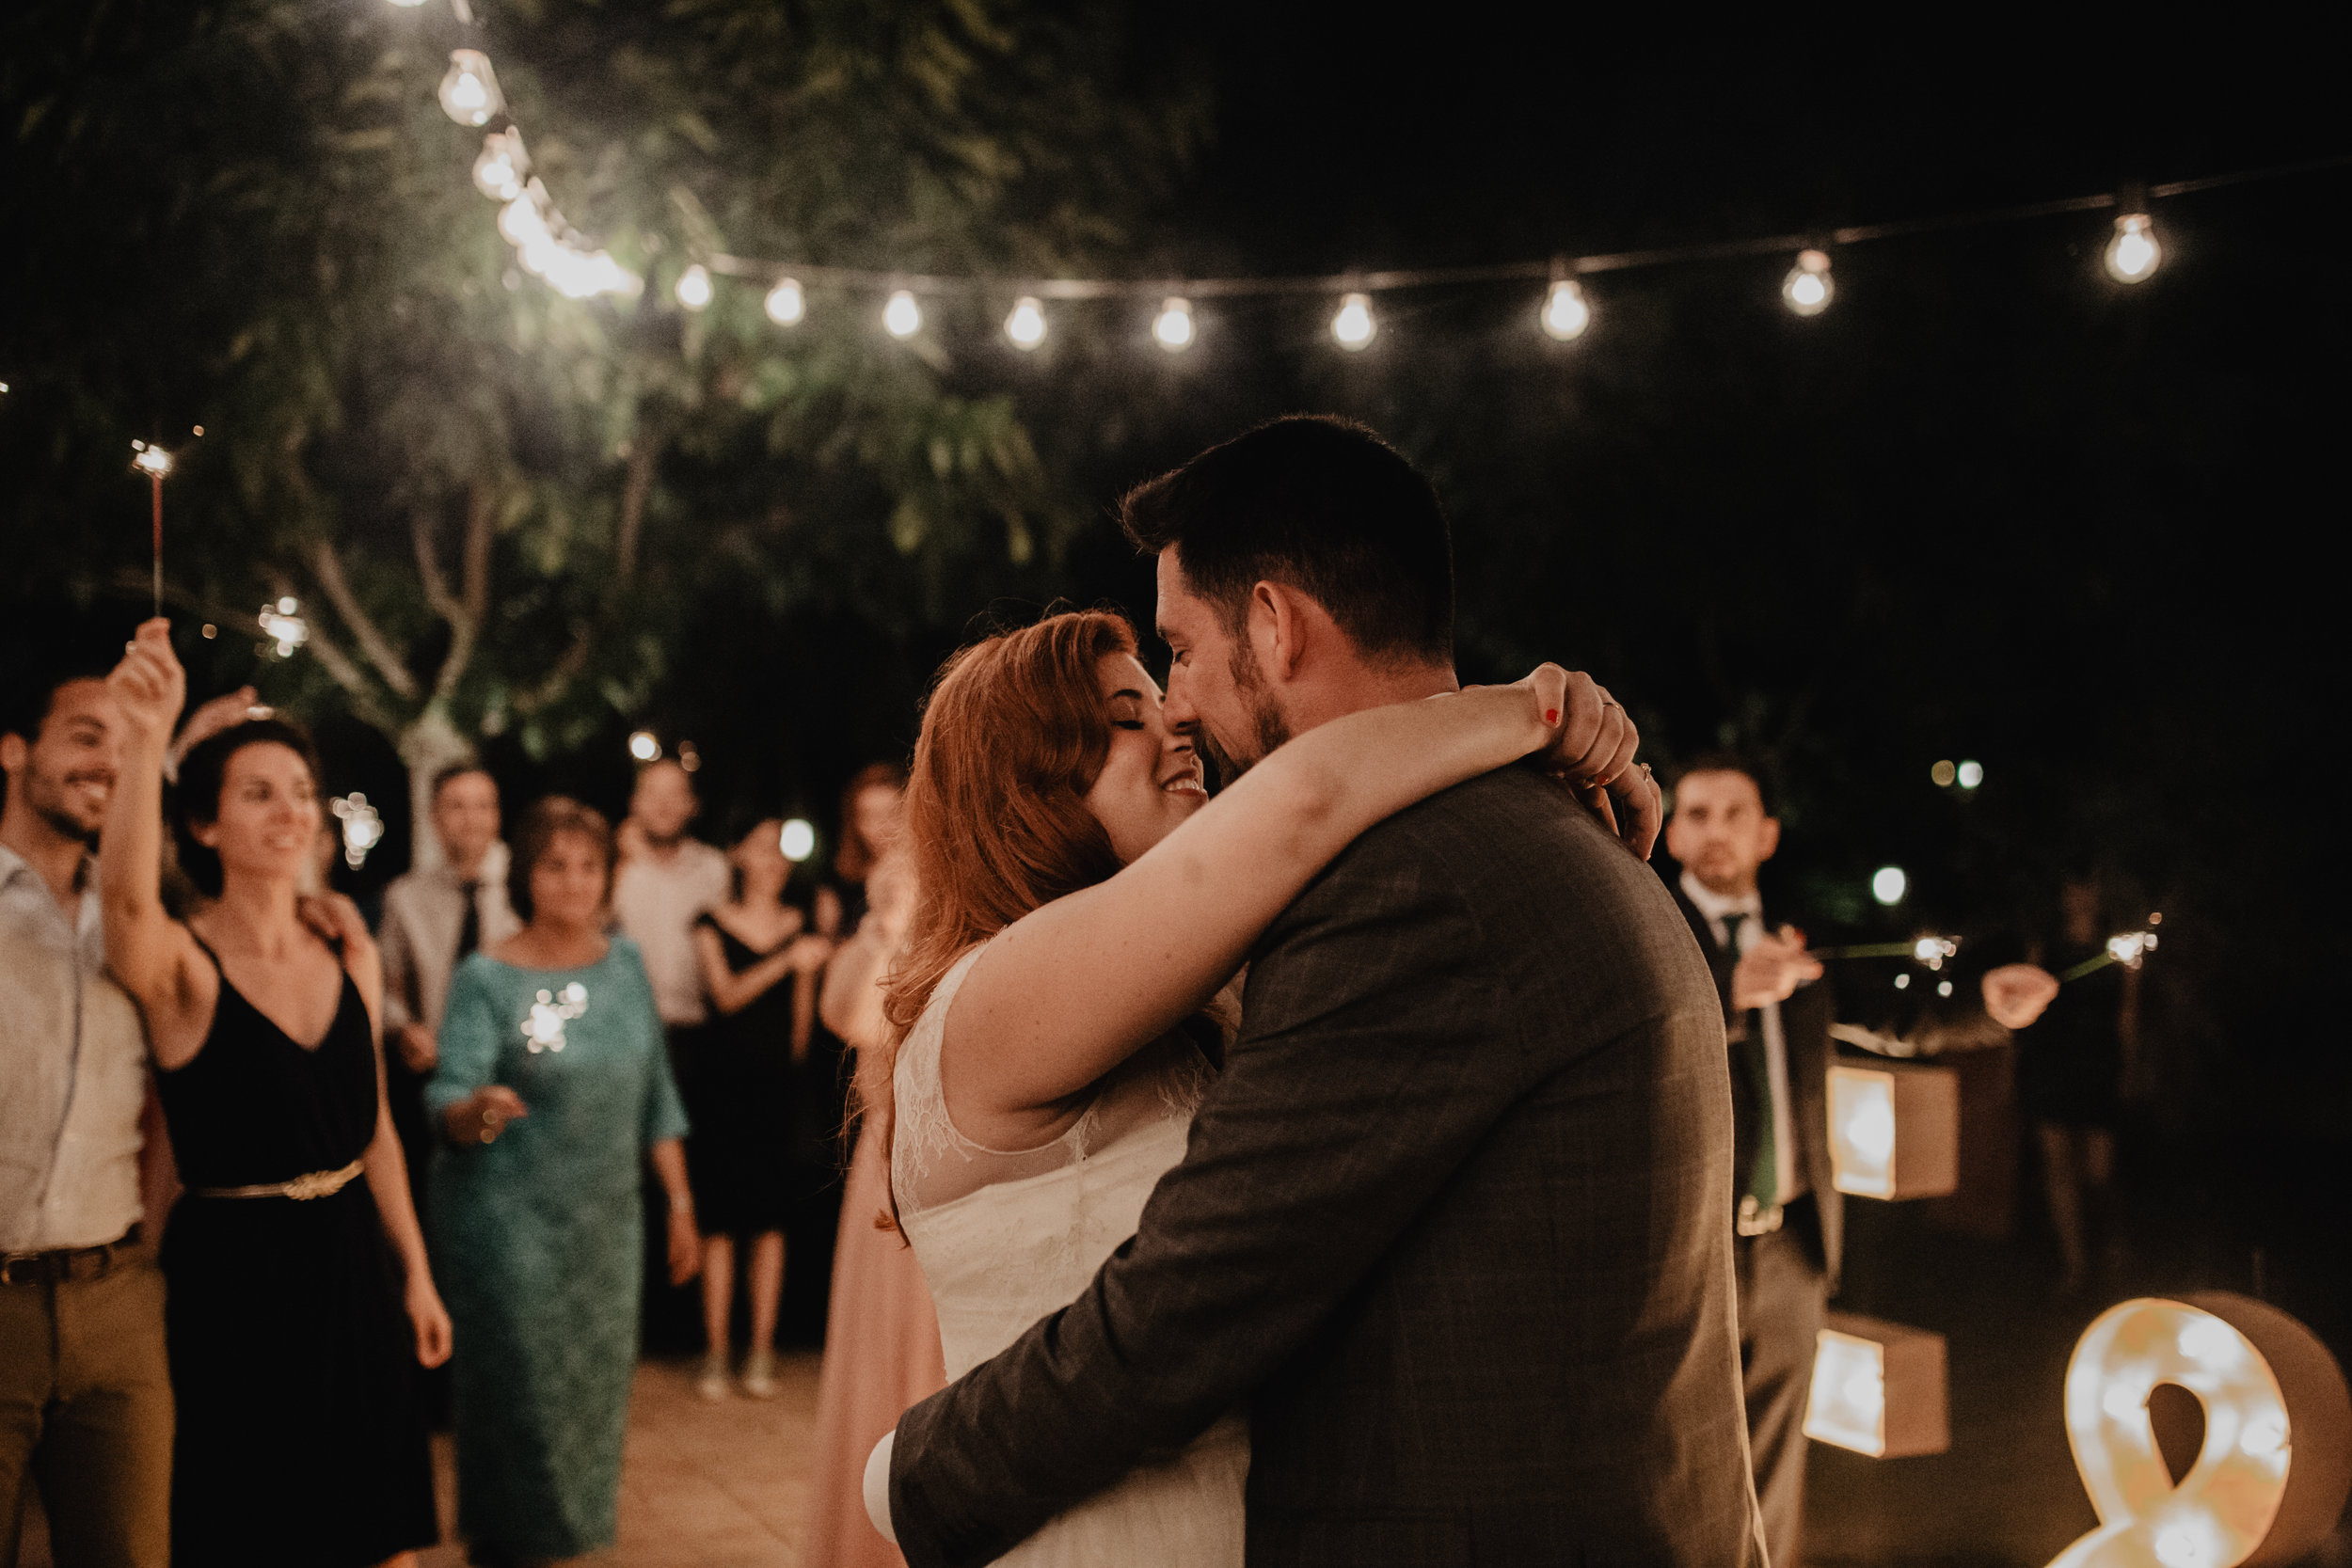 thenortherngirlphotography_photography_thenortherngirl_rebeccascabros_wedding_weddingphotography_masialagarrigadecastelladral_joaniemma_bodaenbarcelona_weddingphotographer_emmaijoan-1068.jpg